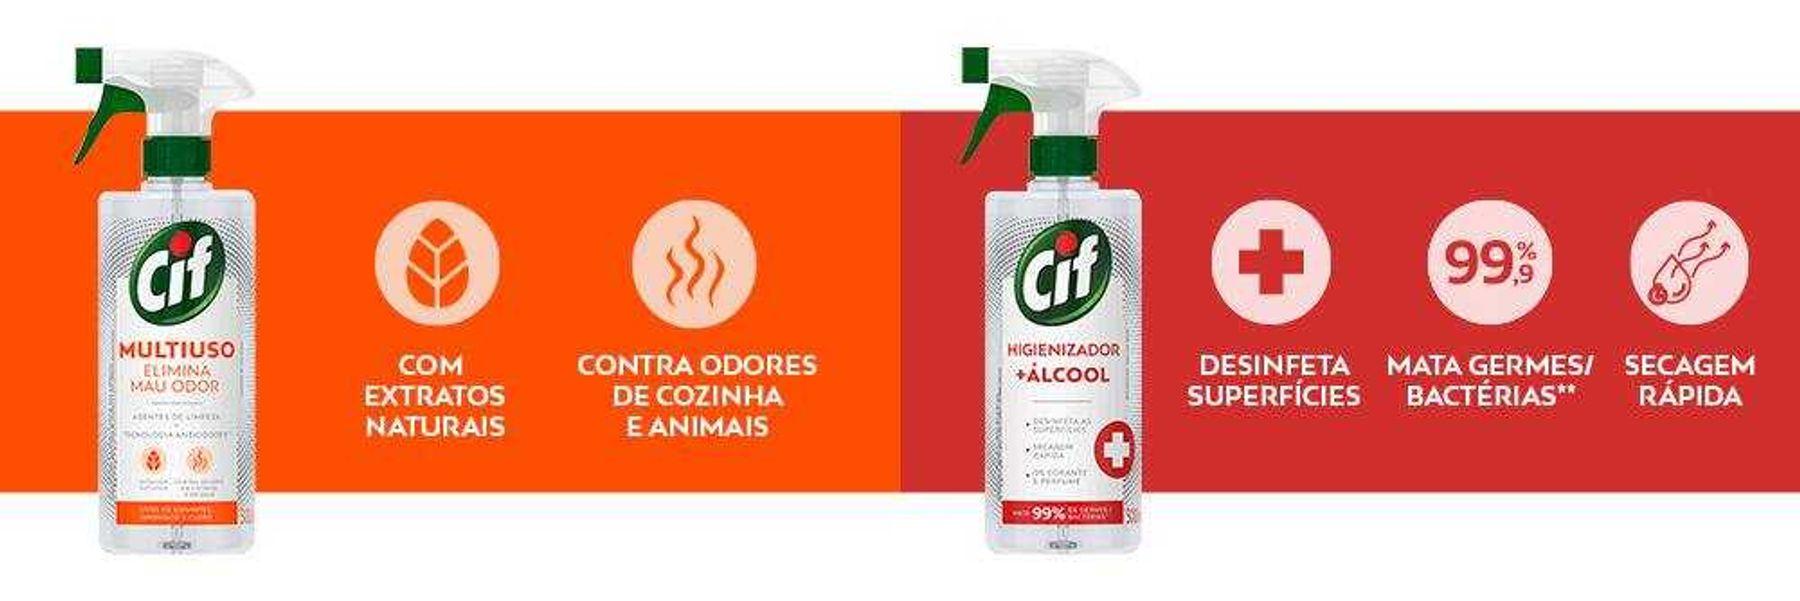 cif-multiuso-elimina-mau-odor-e-higienizador-alcool